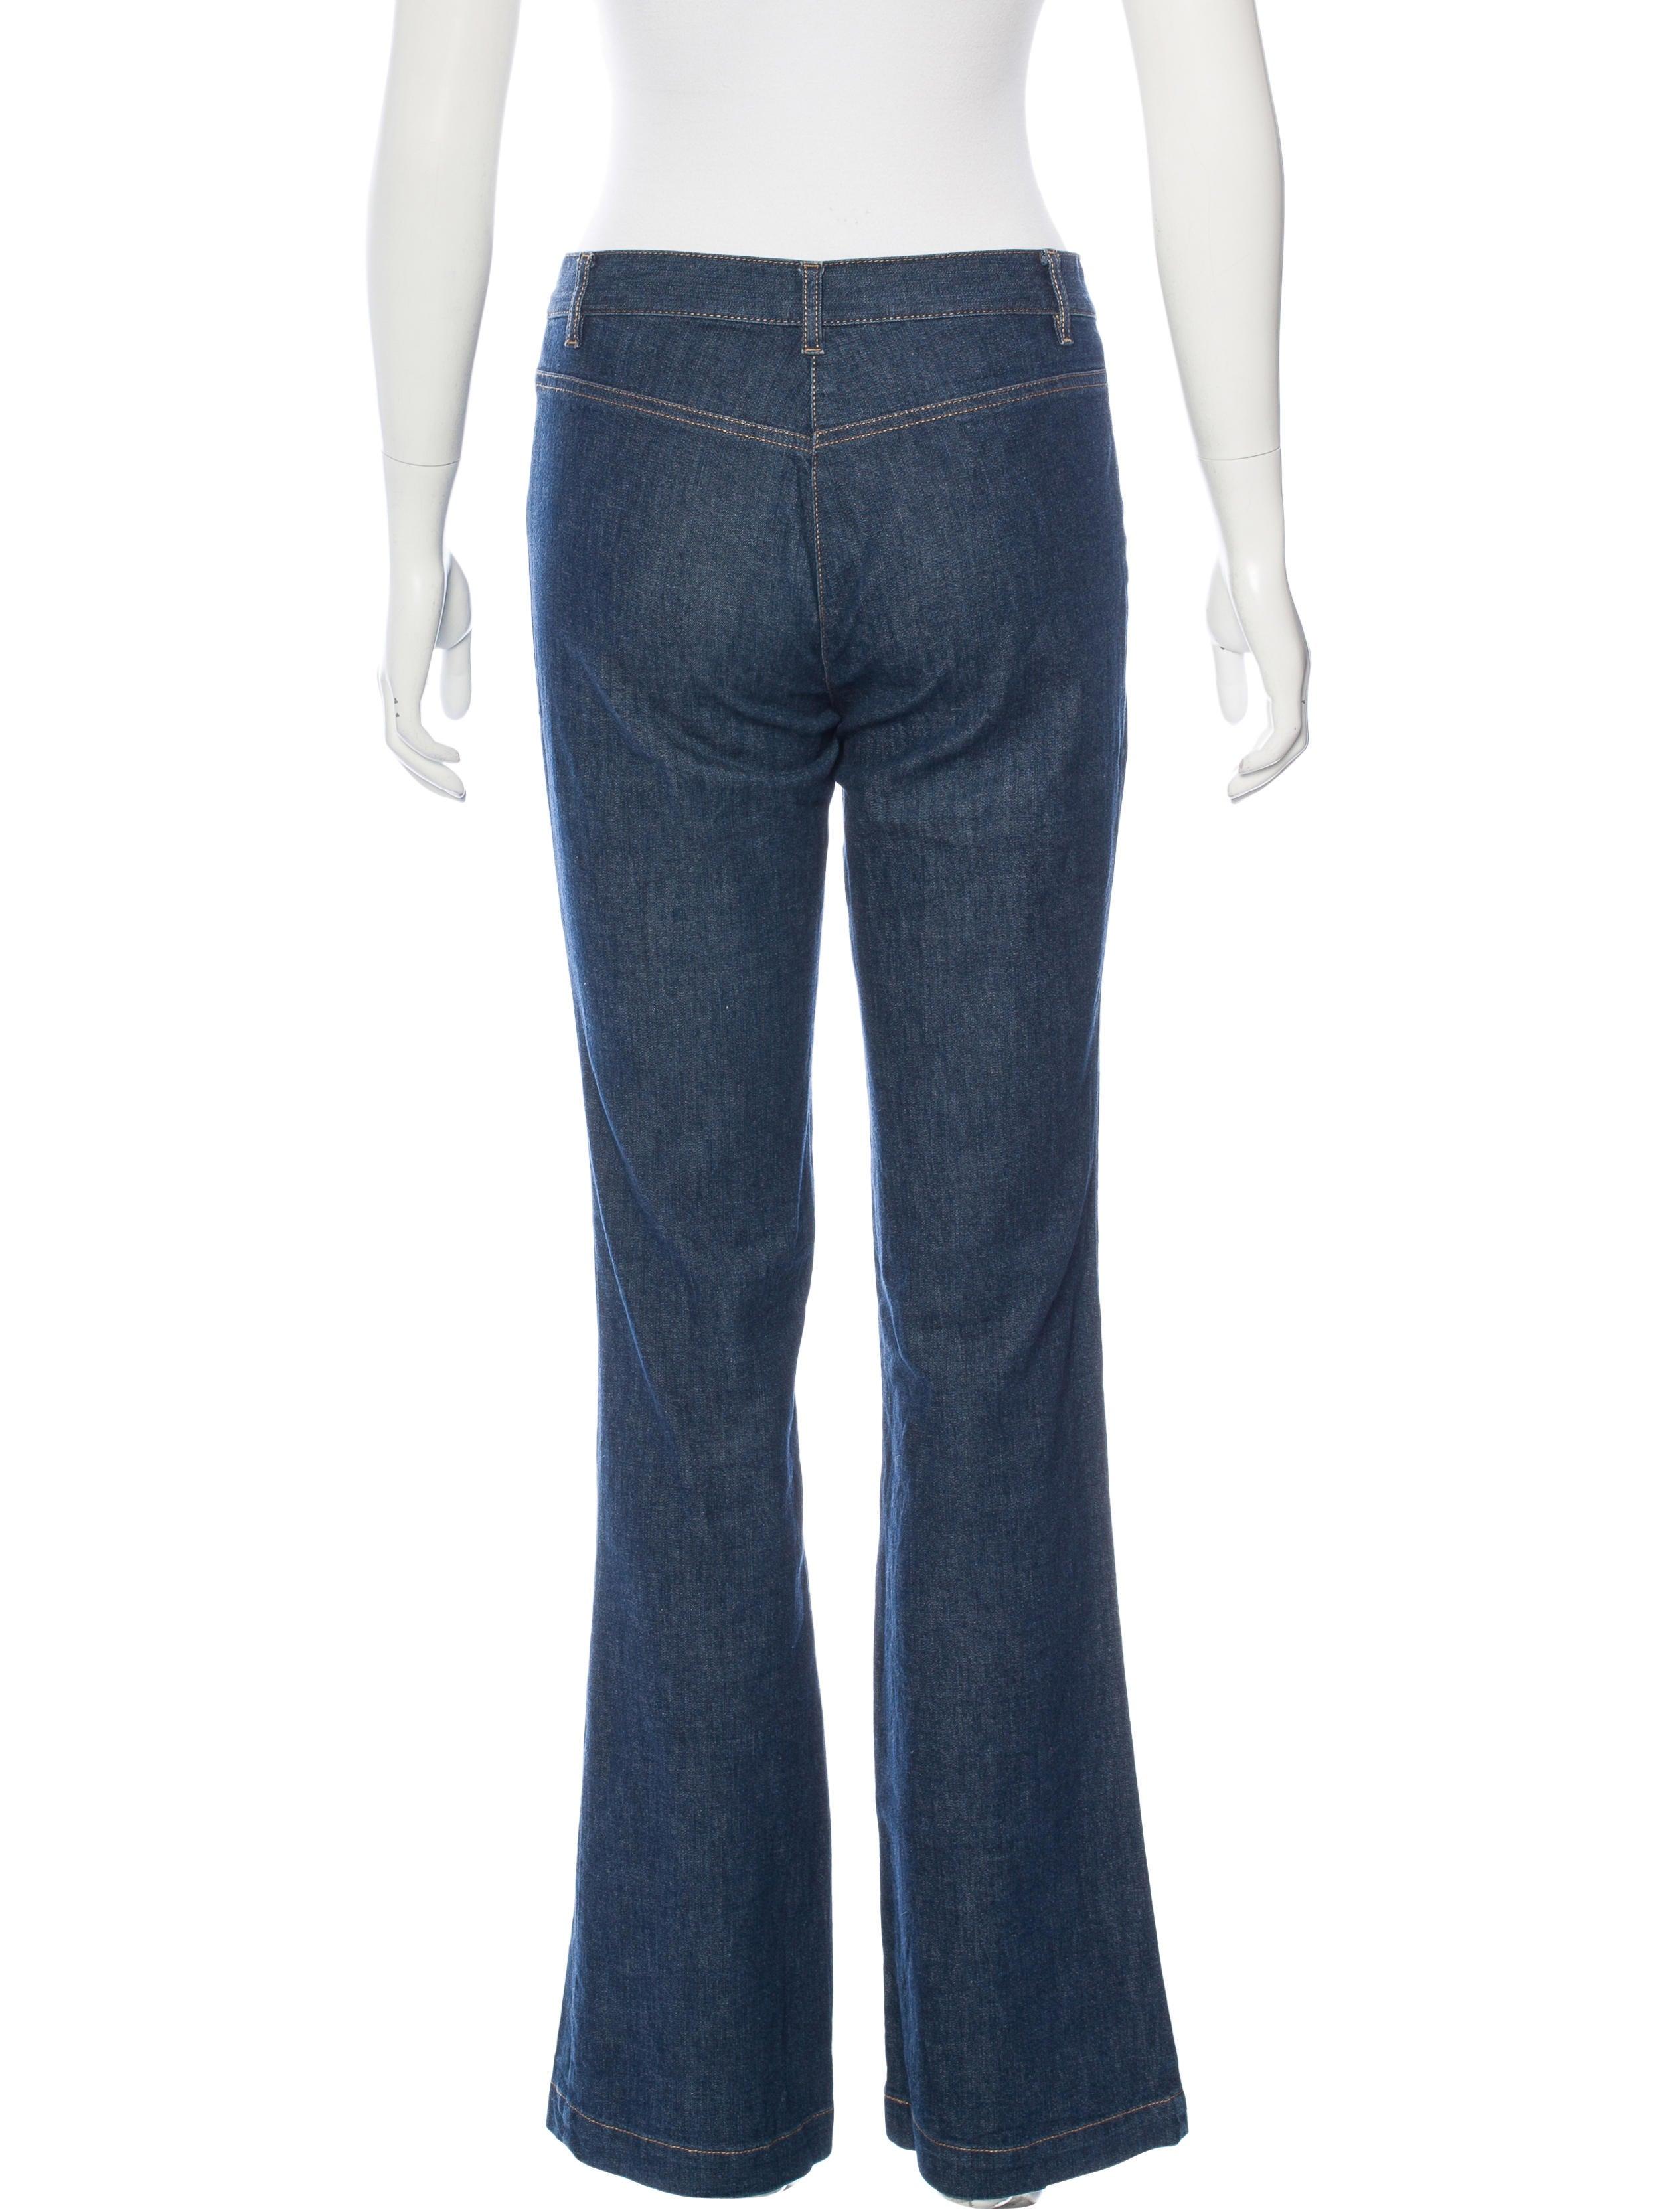 Christian Lacroix Mid Rise Wide Leg Jeans Clothing